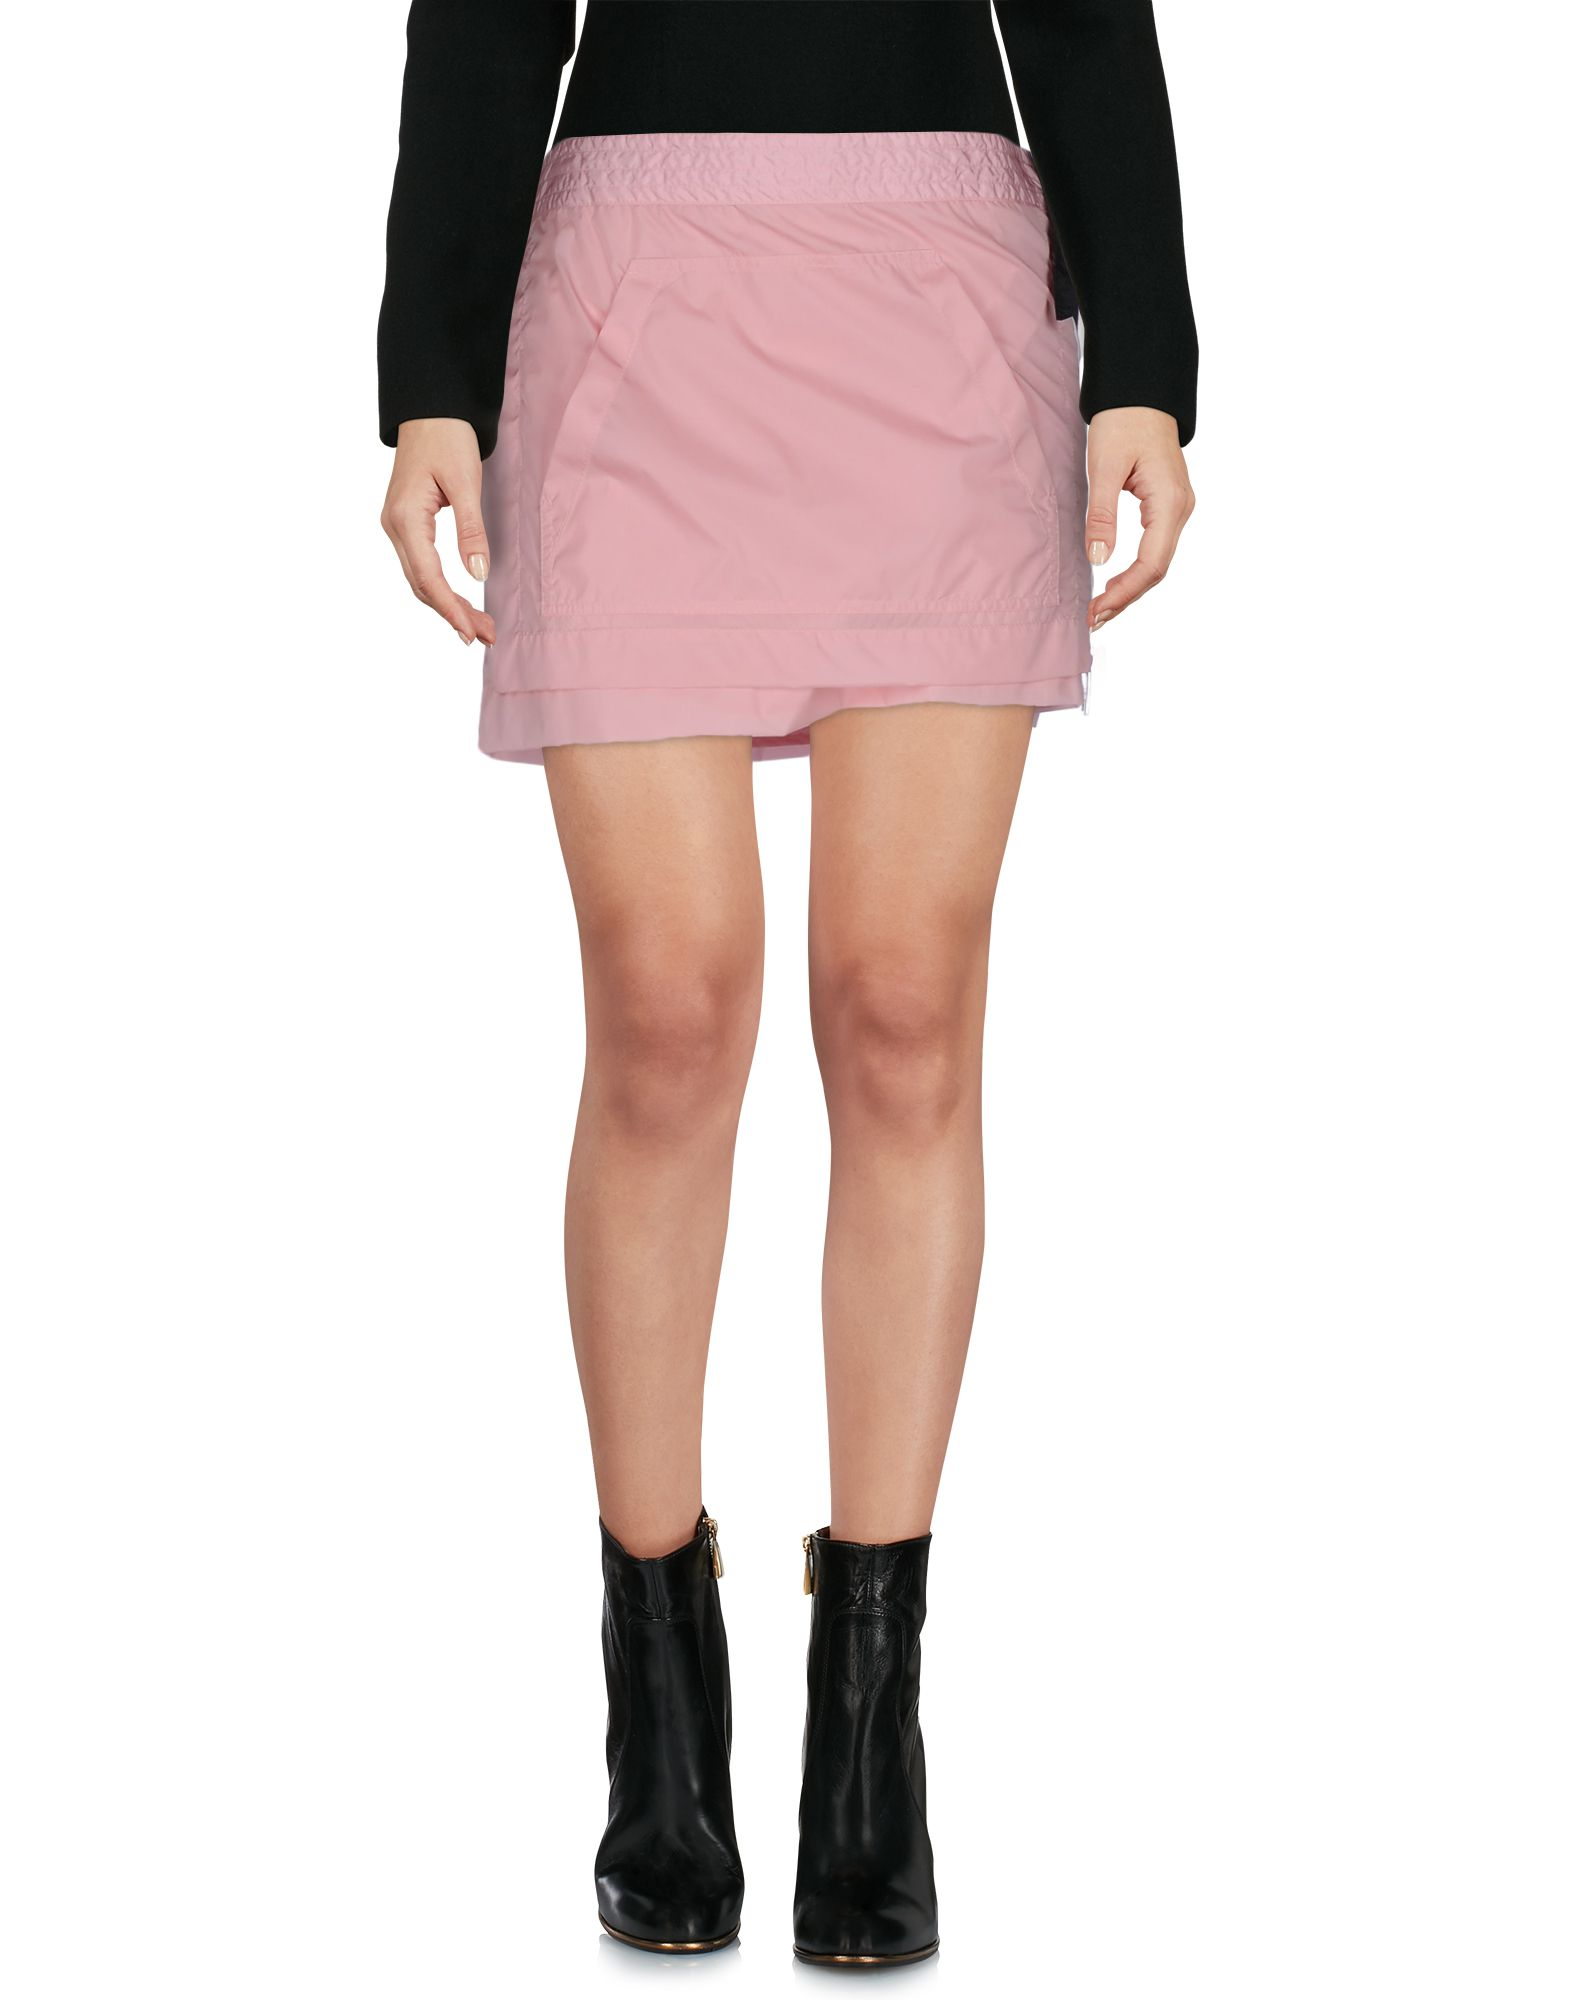 цены на FAY Мини-юбка в интернет-магазинах